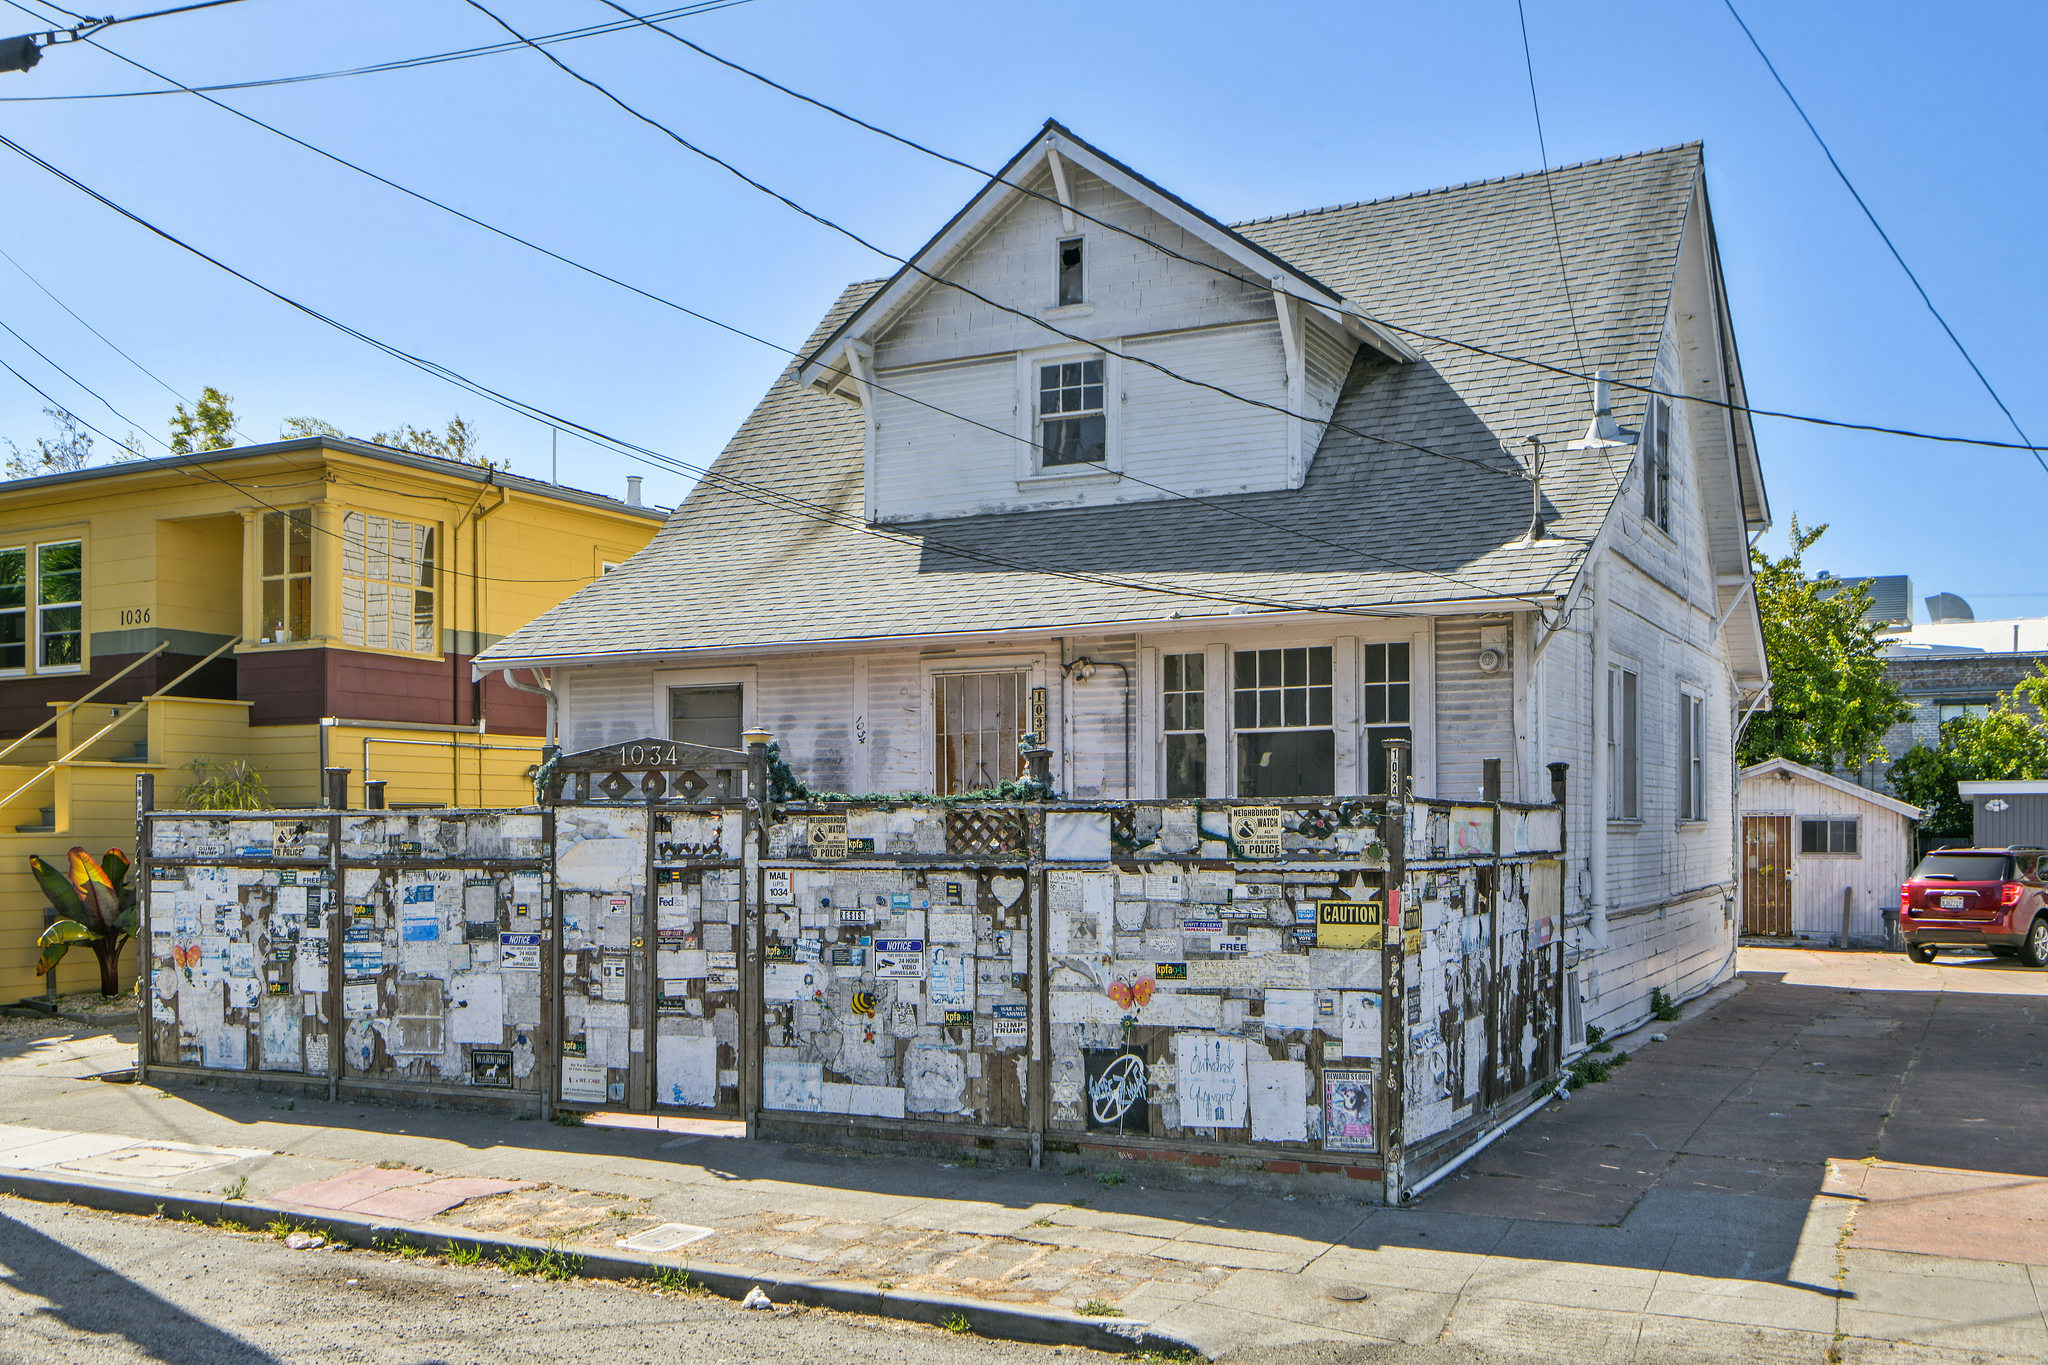 All property photos